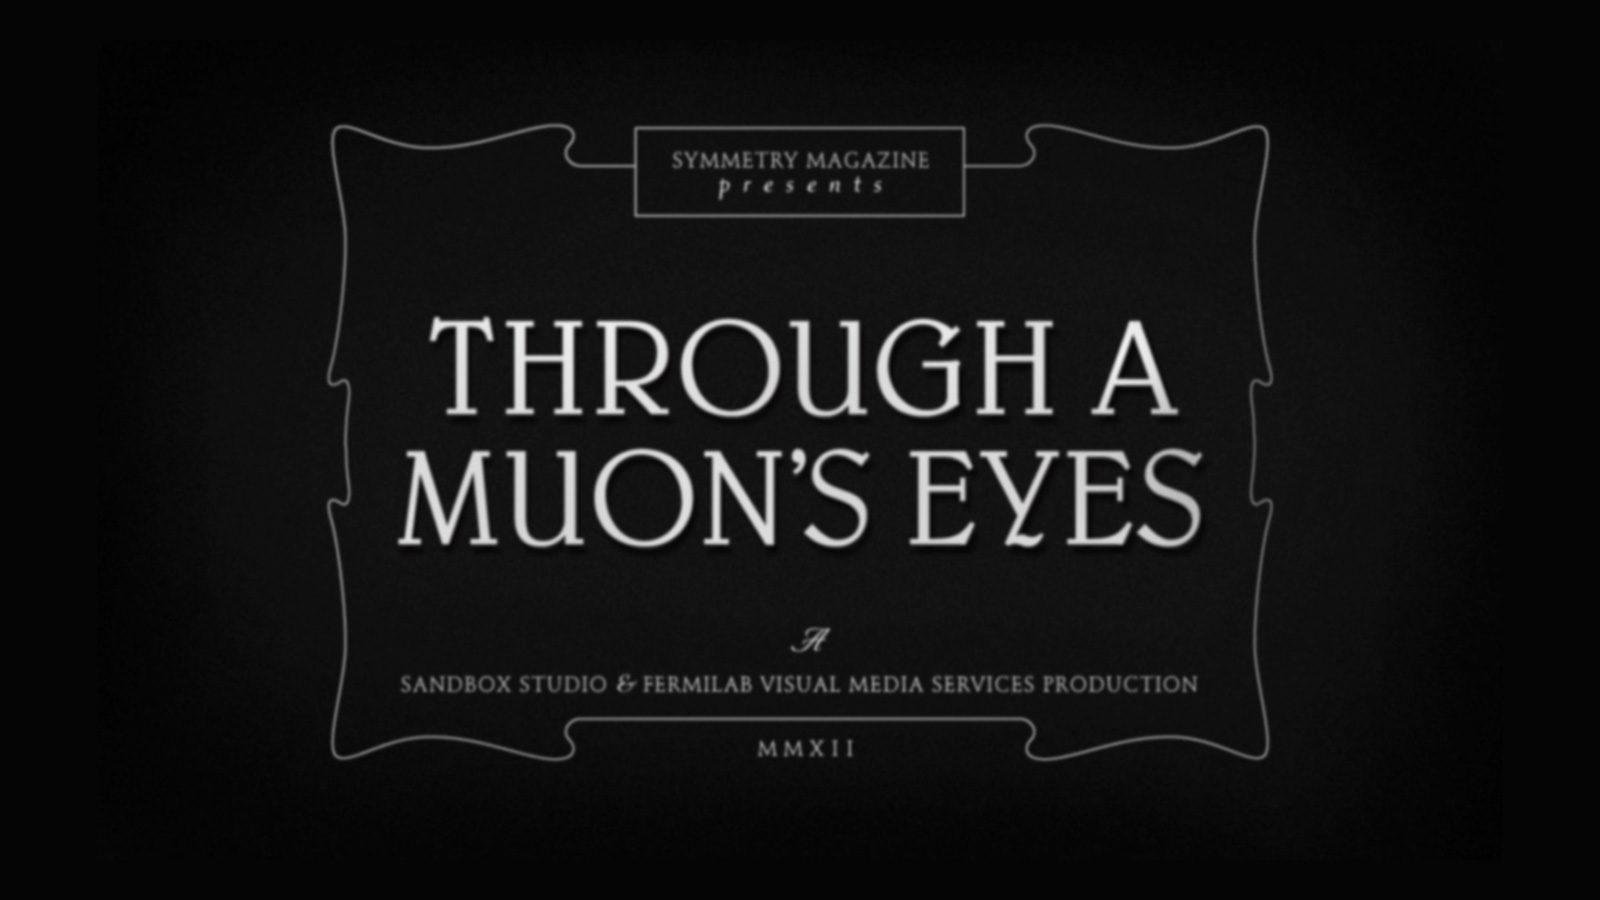 Through a Muon's Eyes